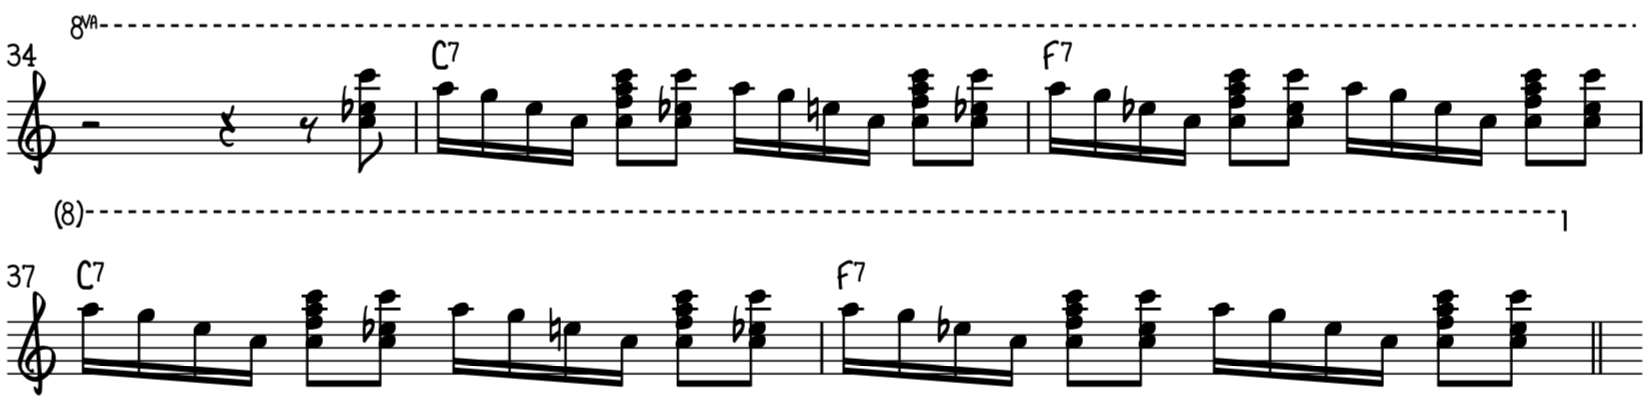 Intermediate funky blues piano riff 5 alternates large harmonized notes and blues rolls